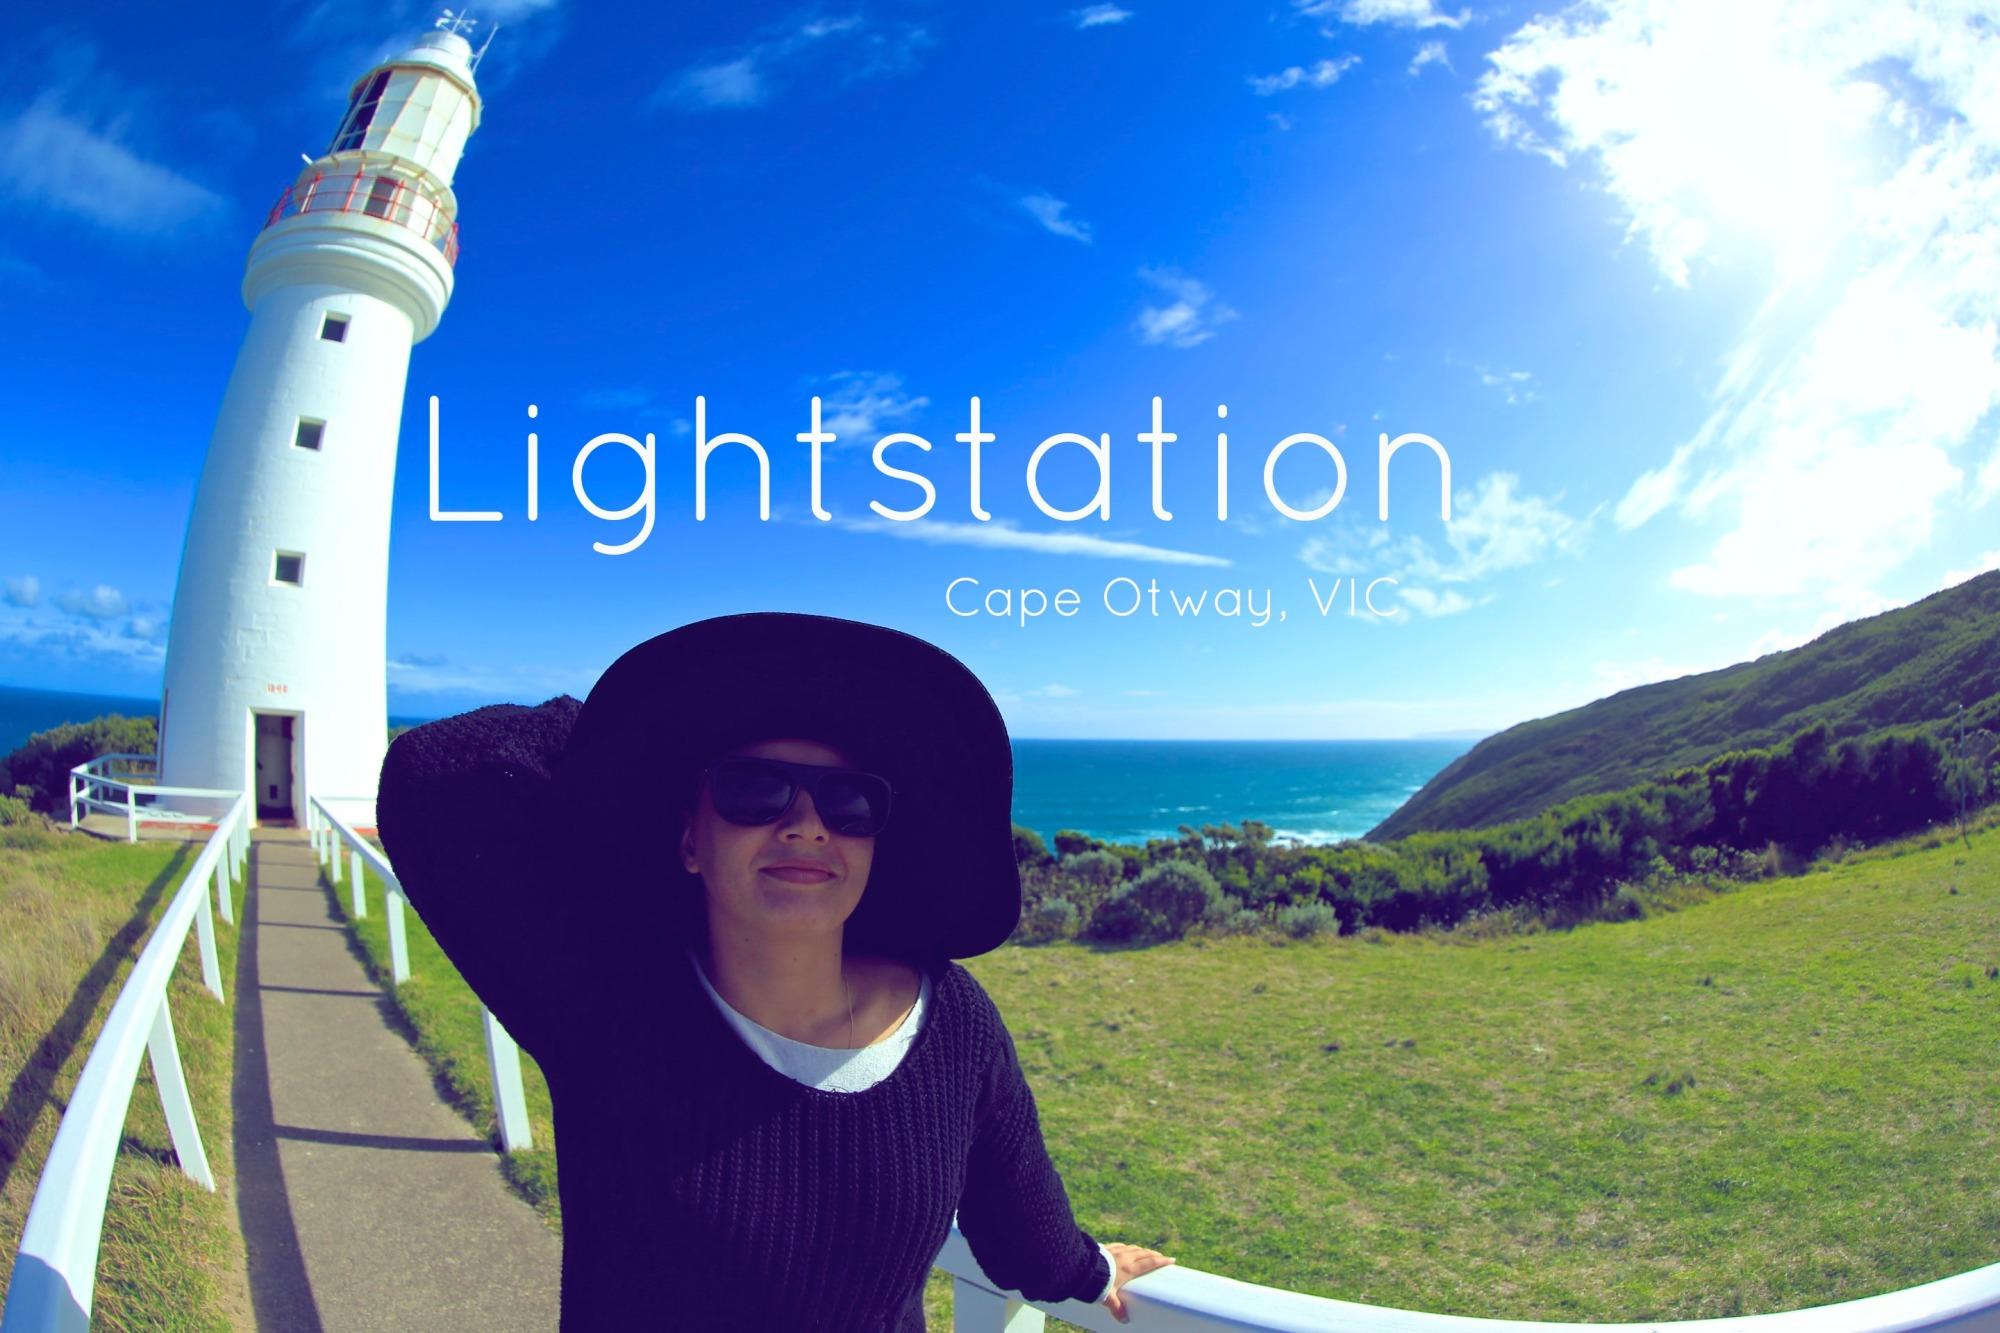 Cape Otway Lightsation